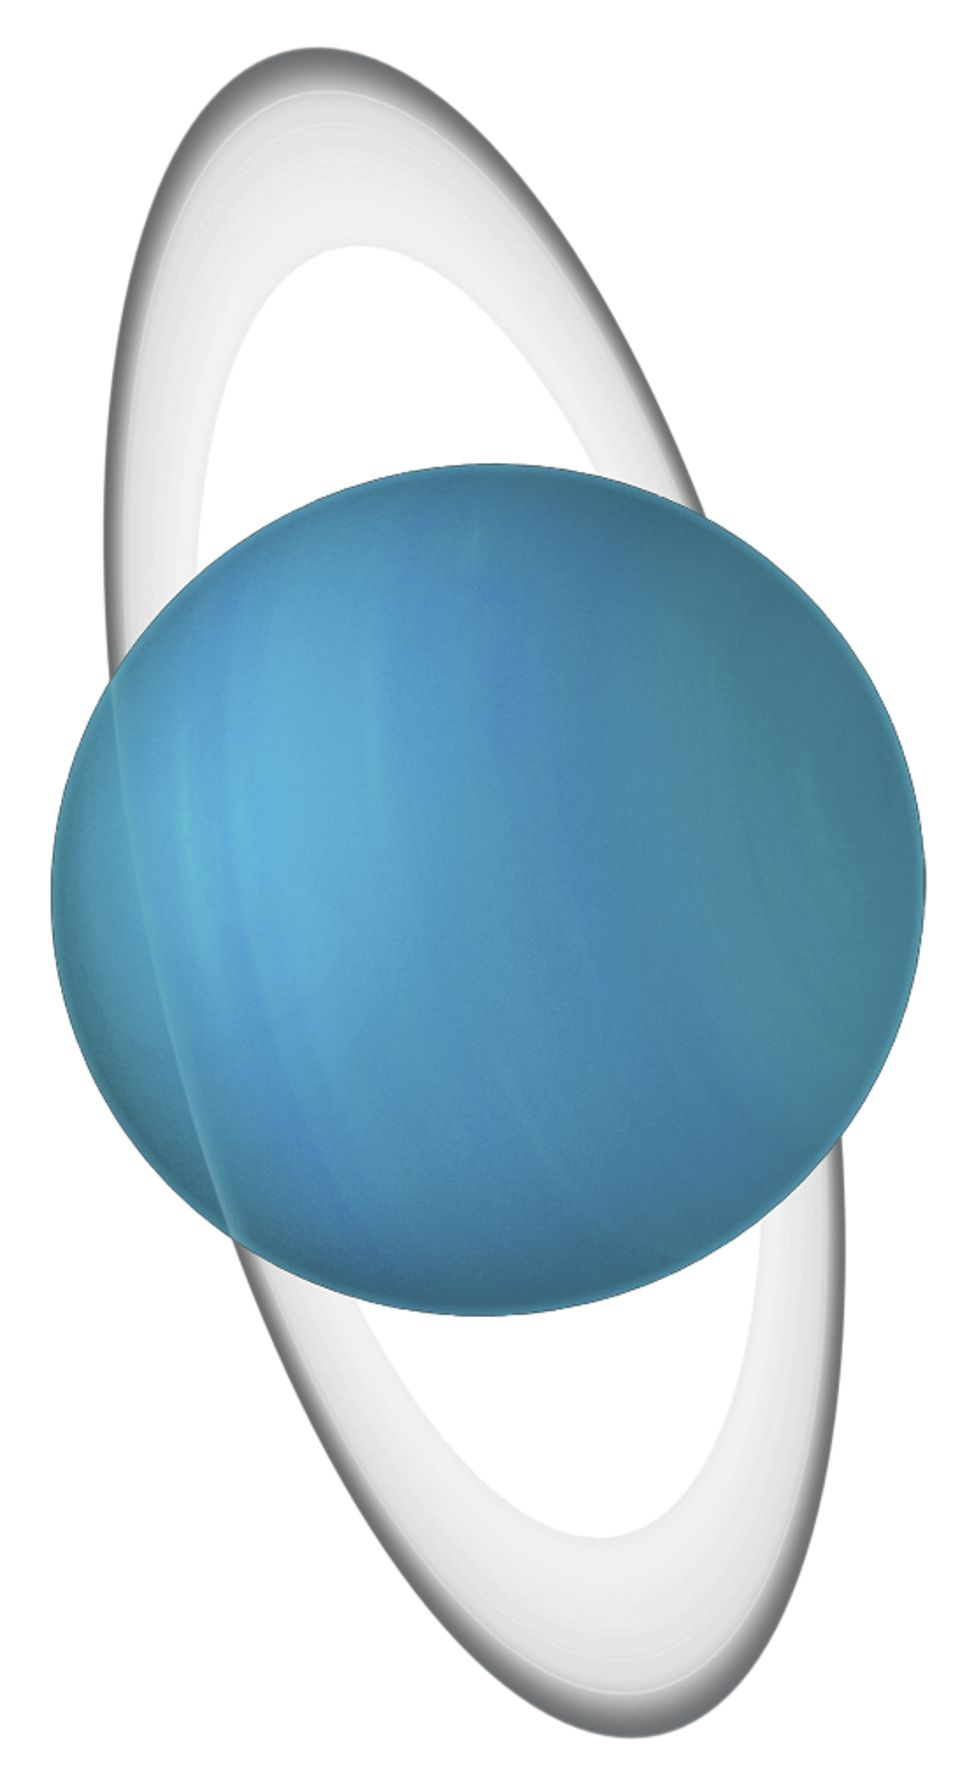 Uranus Its Rings and Clip Art.